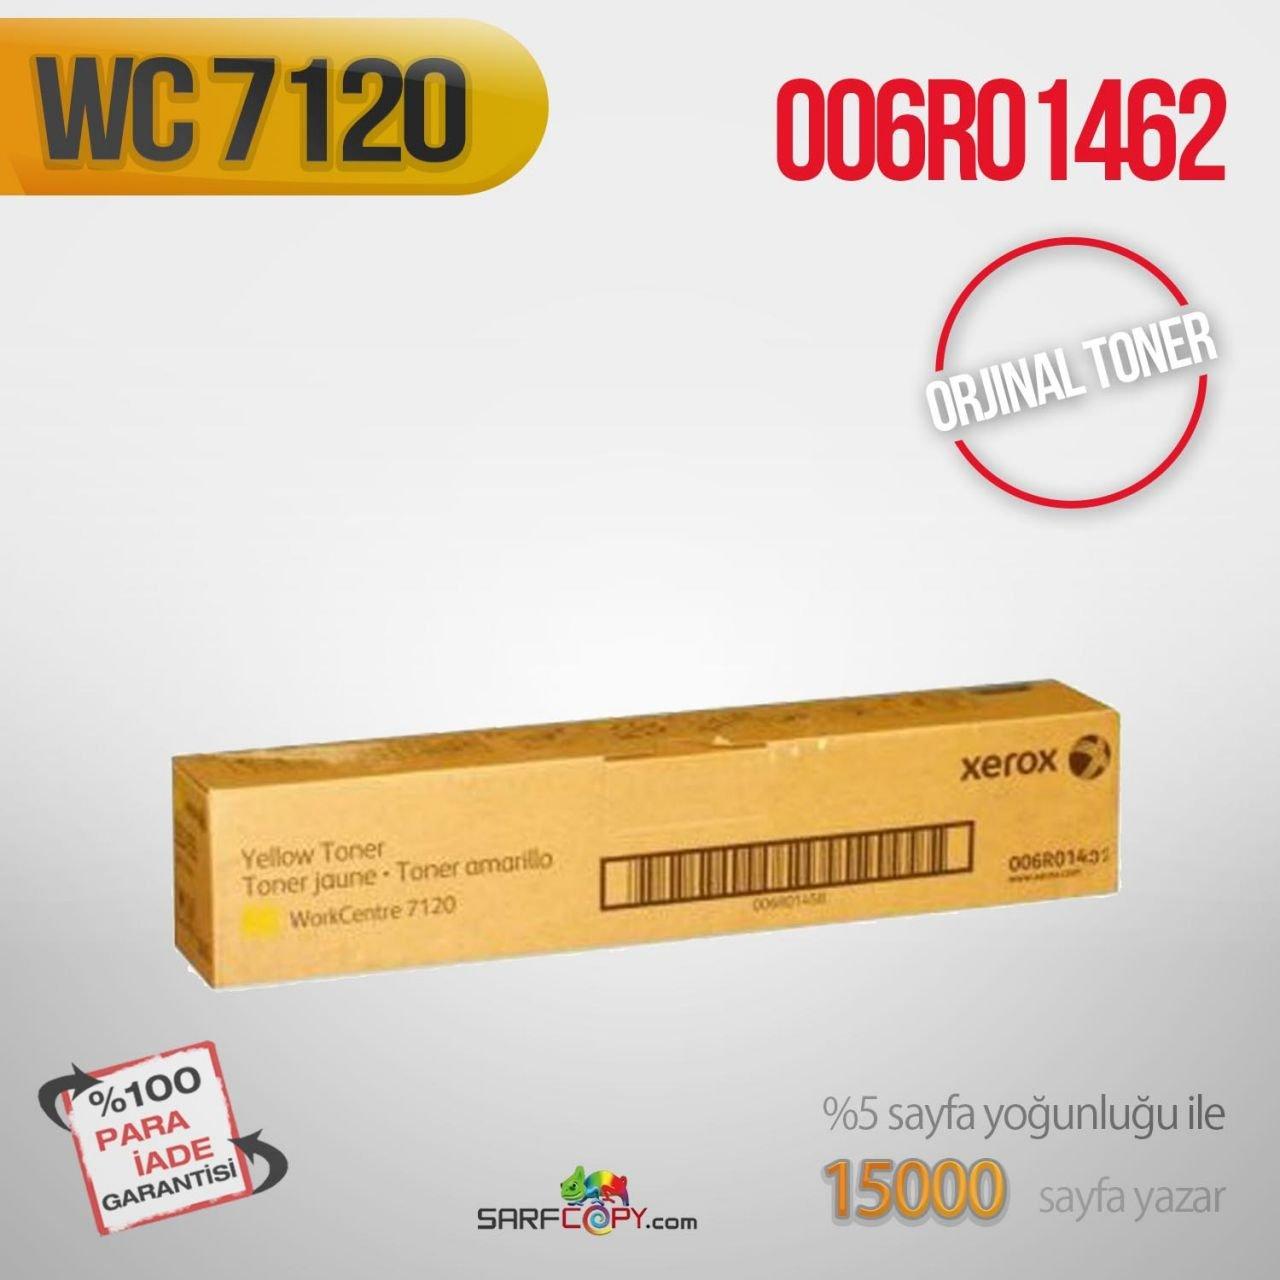 Тонер-туба xerox 006r01462 жёлтый (15000 страниц) для wc7120/7125